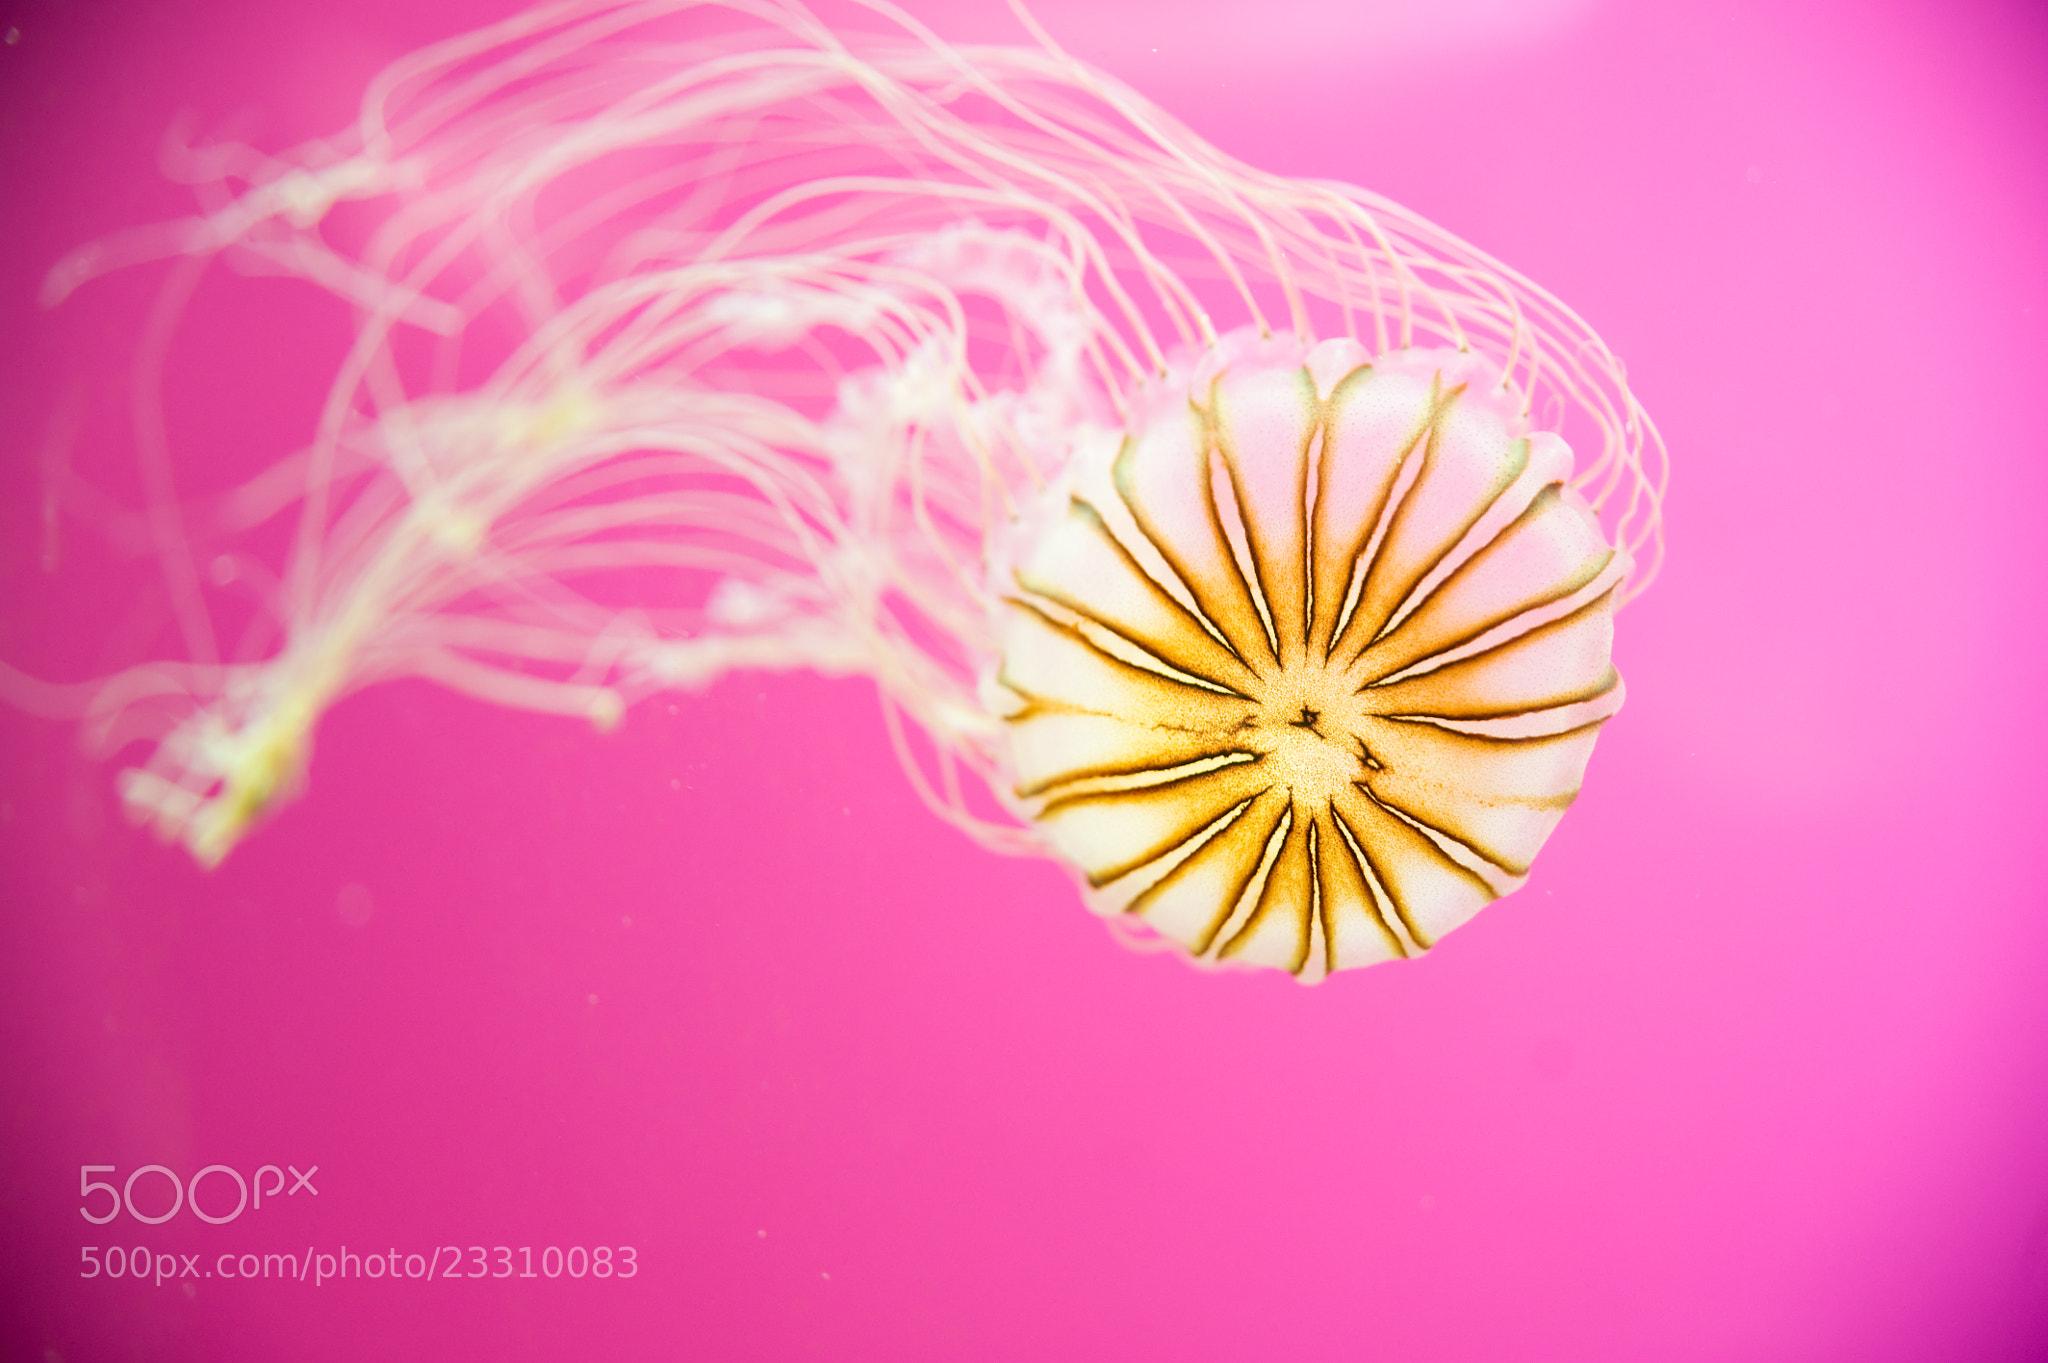 Photograph Purple-Striped Jellyfish by Melanie Geroche on 500px